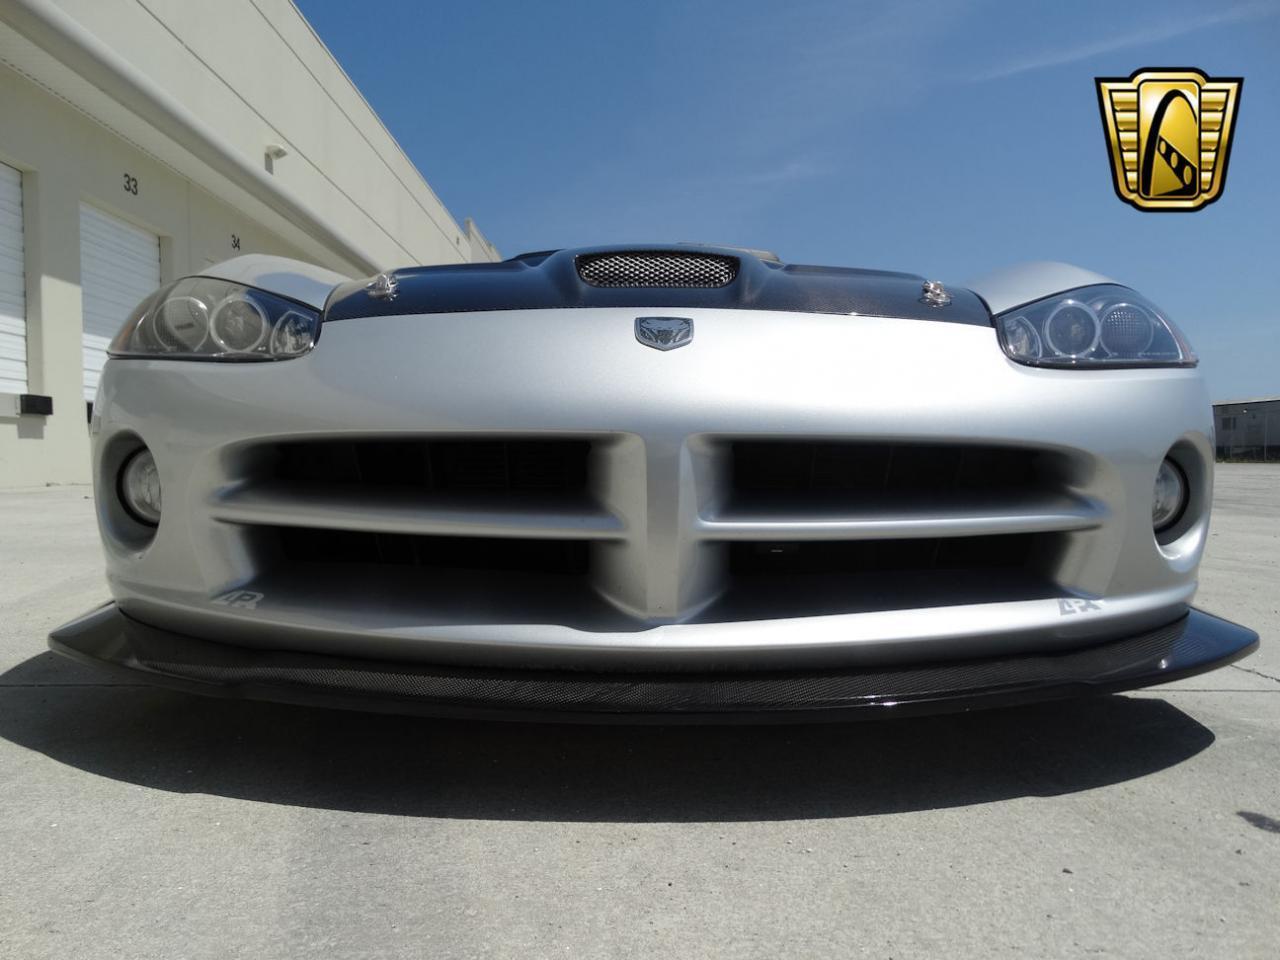 Large Picture of 2004 Dodge Viper located in Florida - $54,000.00 - L6GU